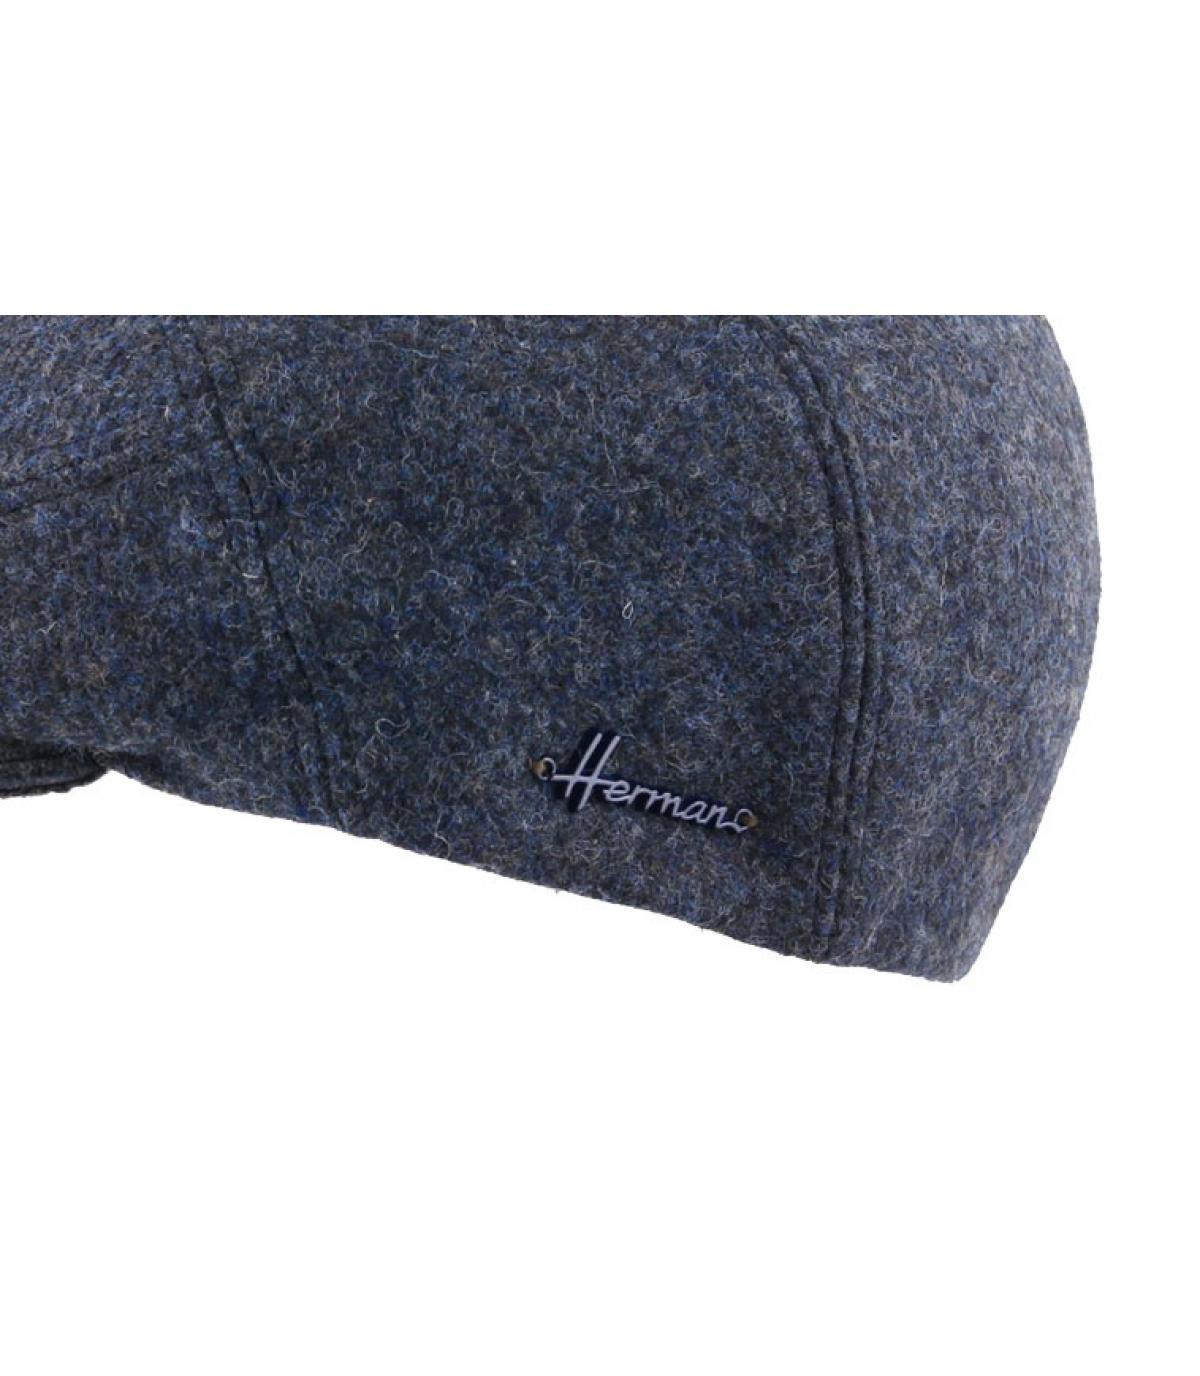 Details Dispatch Wool Corduroy blue - Abbildung 3